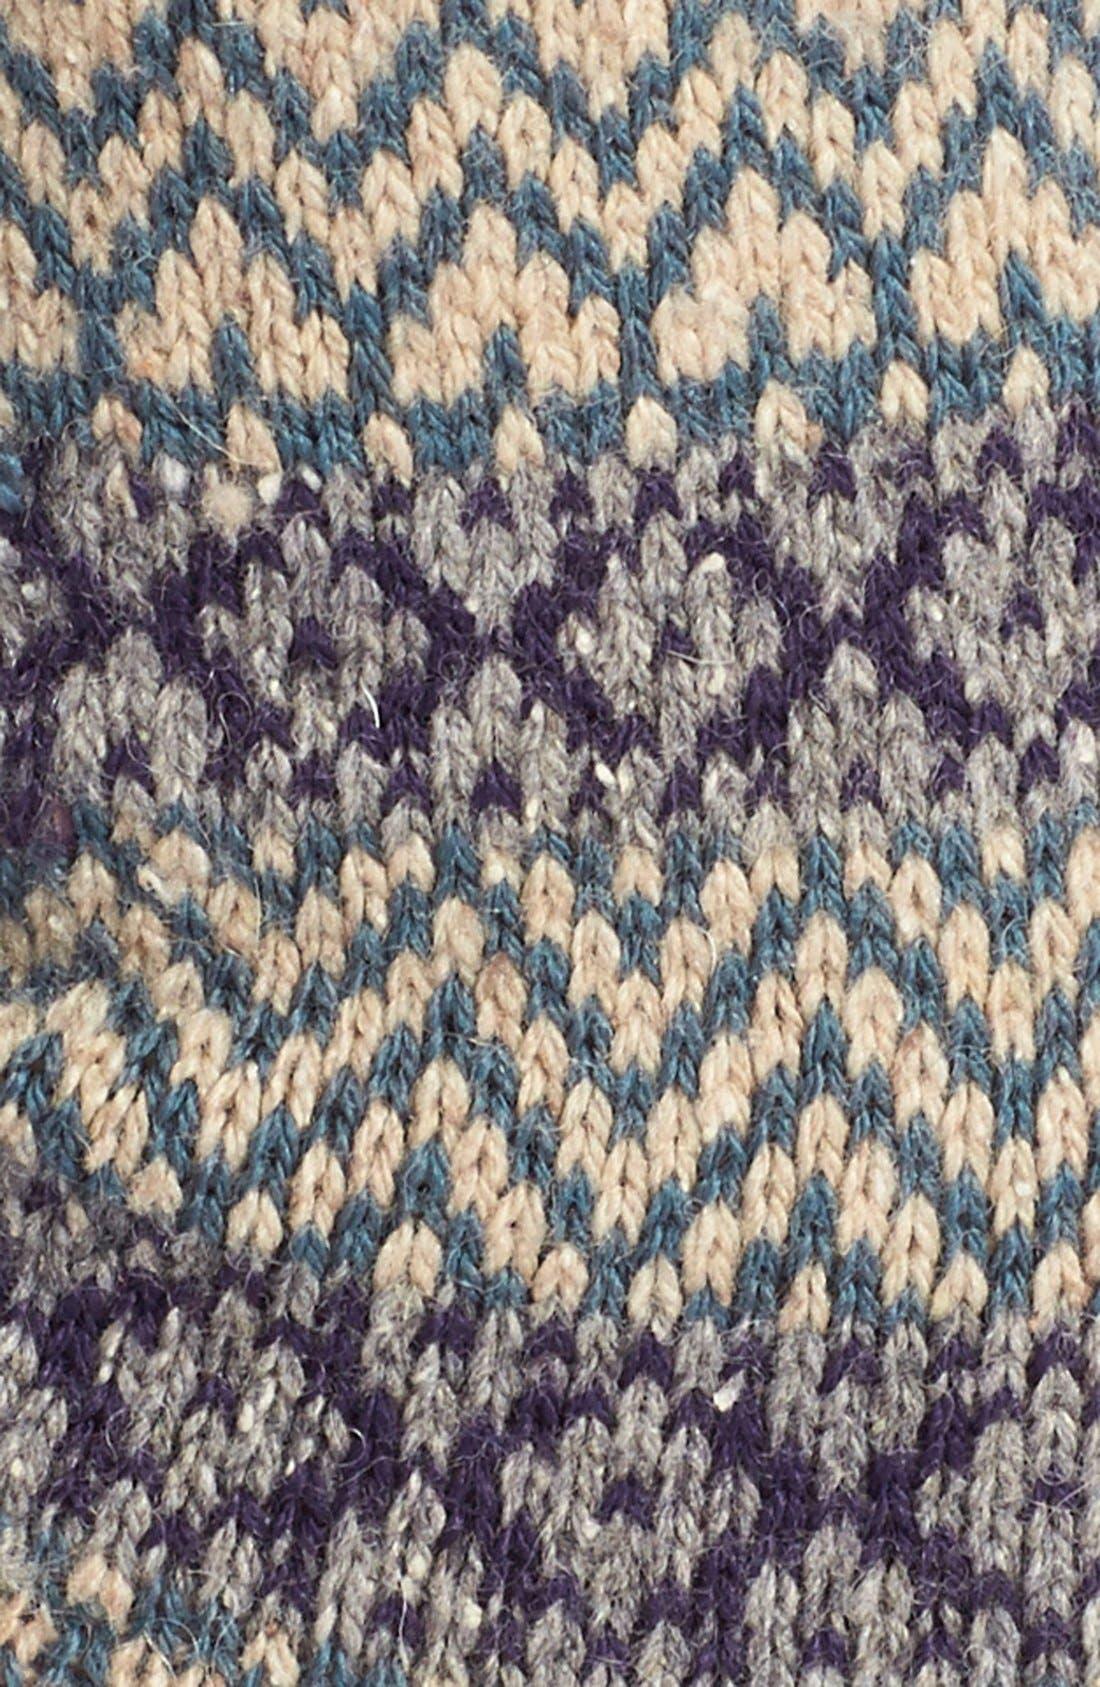 Scott-Nichol 'Rosedale Fair Isle' Wool Blend Socks,                             Alternate thumbnail 2, color,                             026